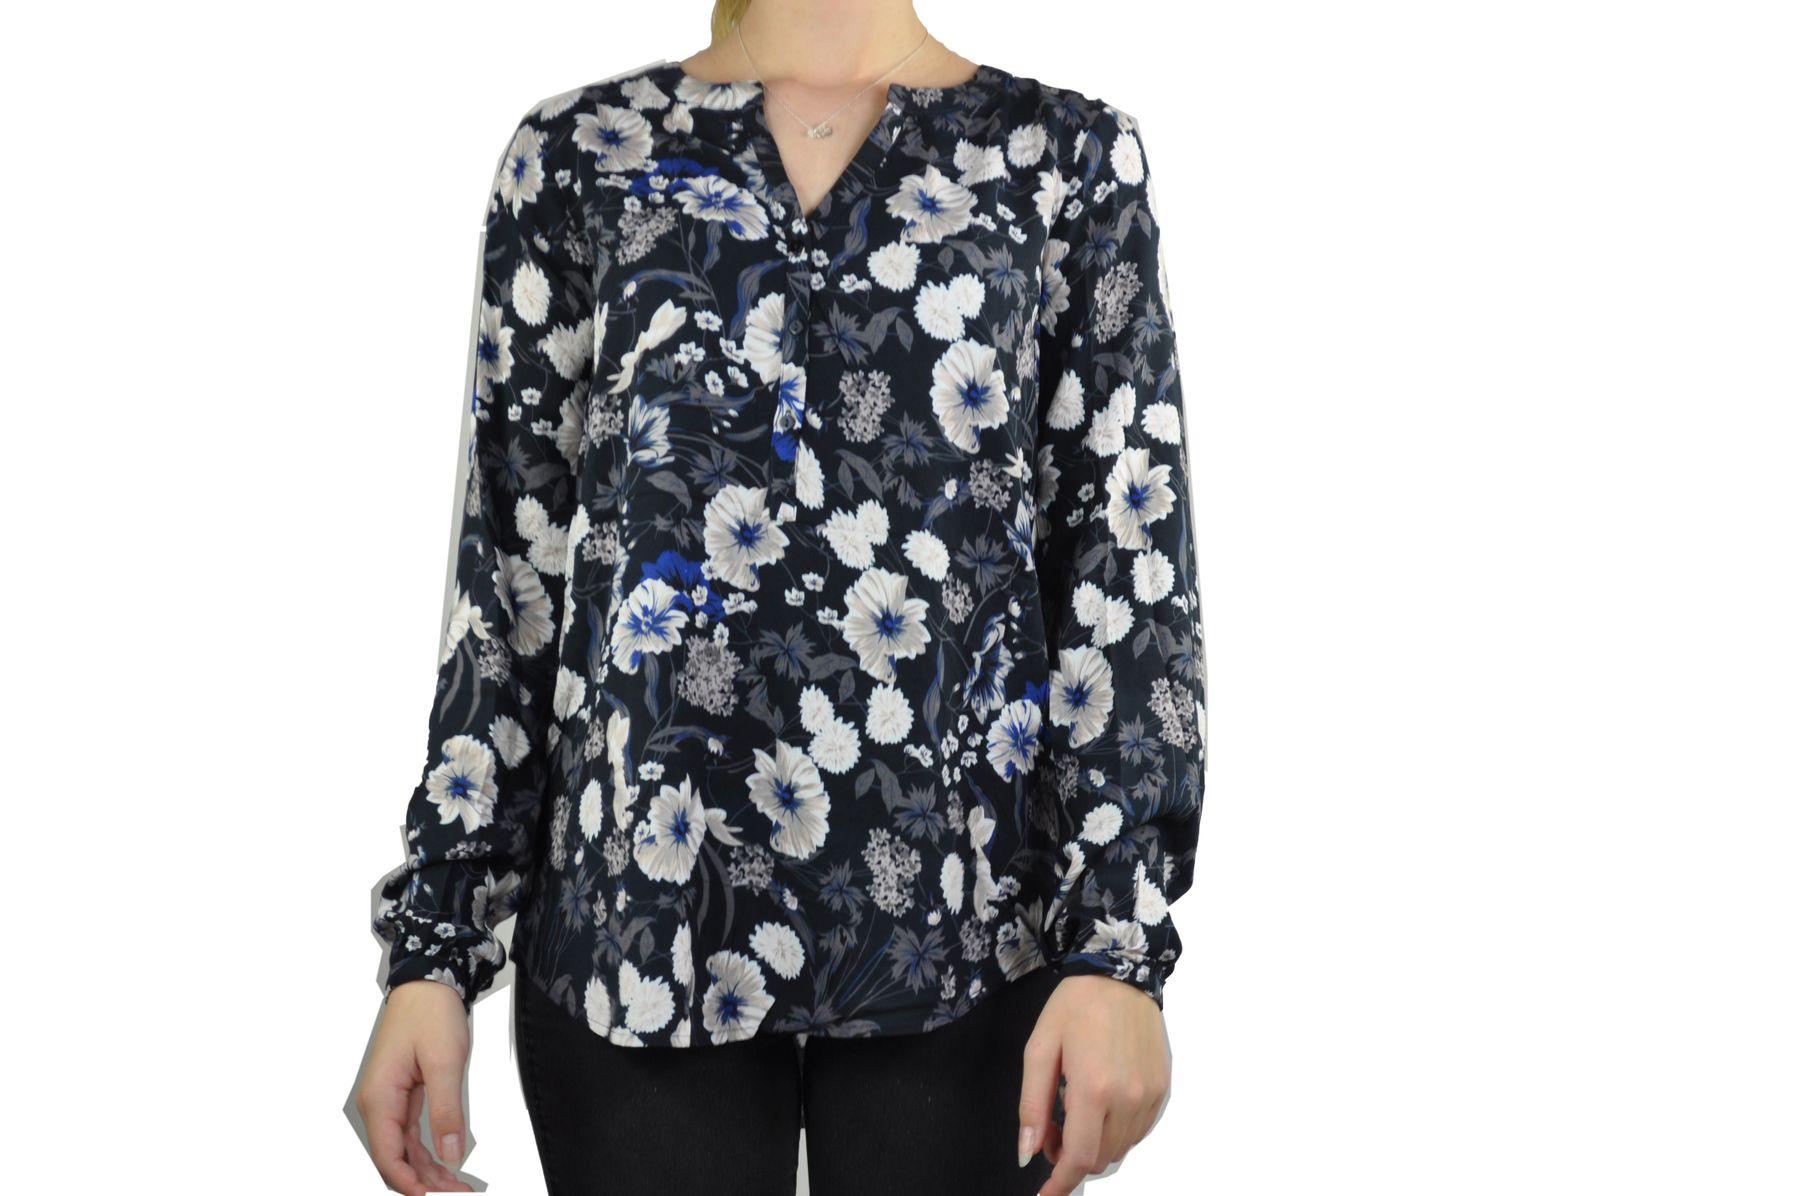 Soyaconcept - Damen Bluse mit Flower Muster, SC-Pammy 1 (14621-30) – Bild 1